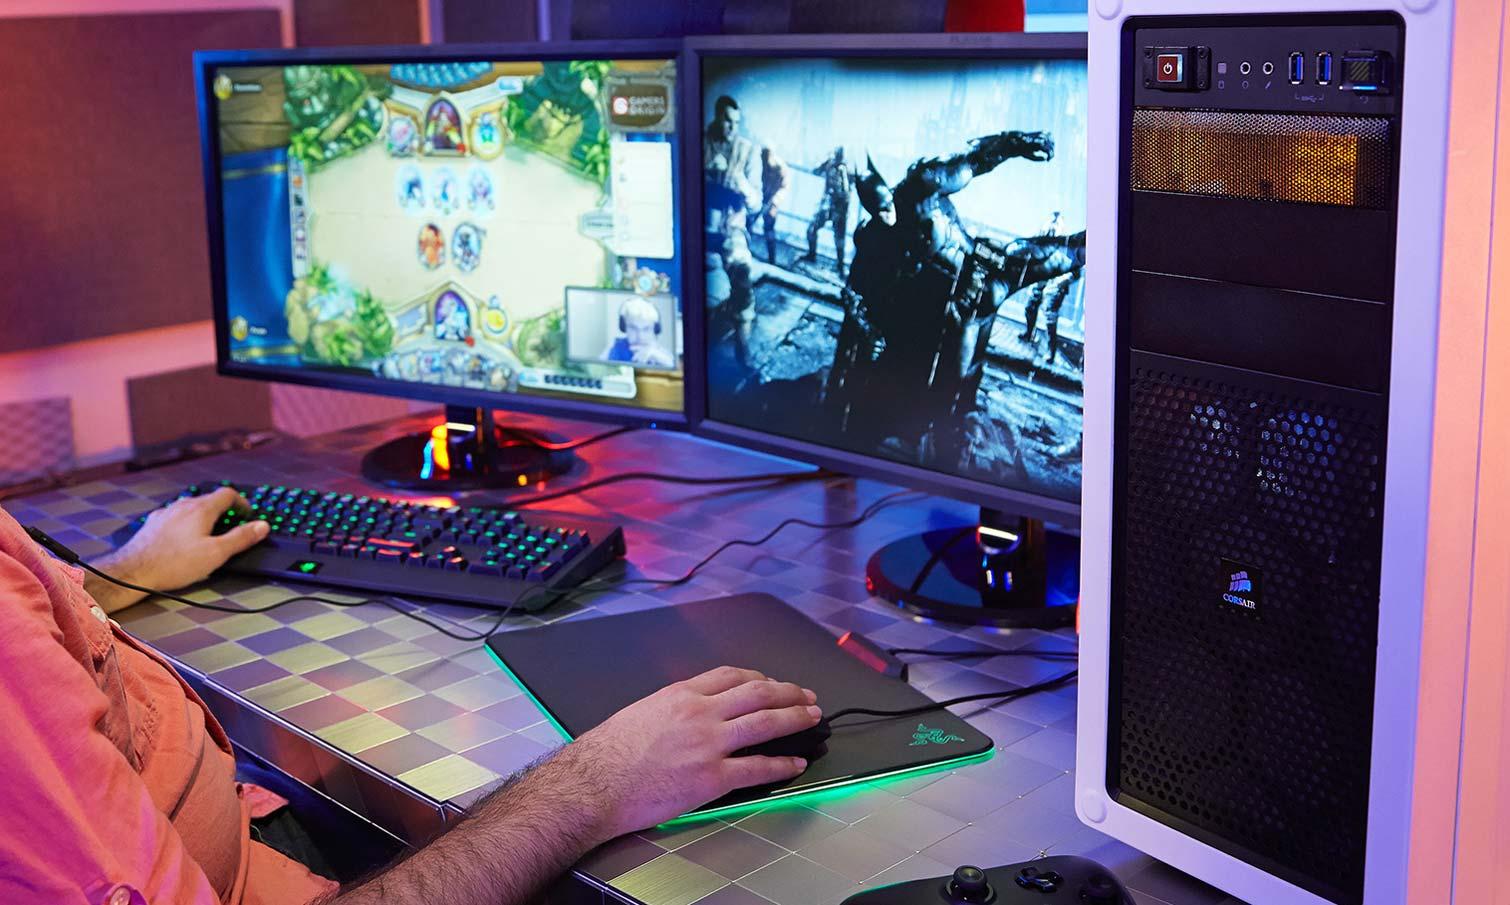 Best Gaming Monitor 2019 - Budget, G-Sync and 4K Monitors